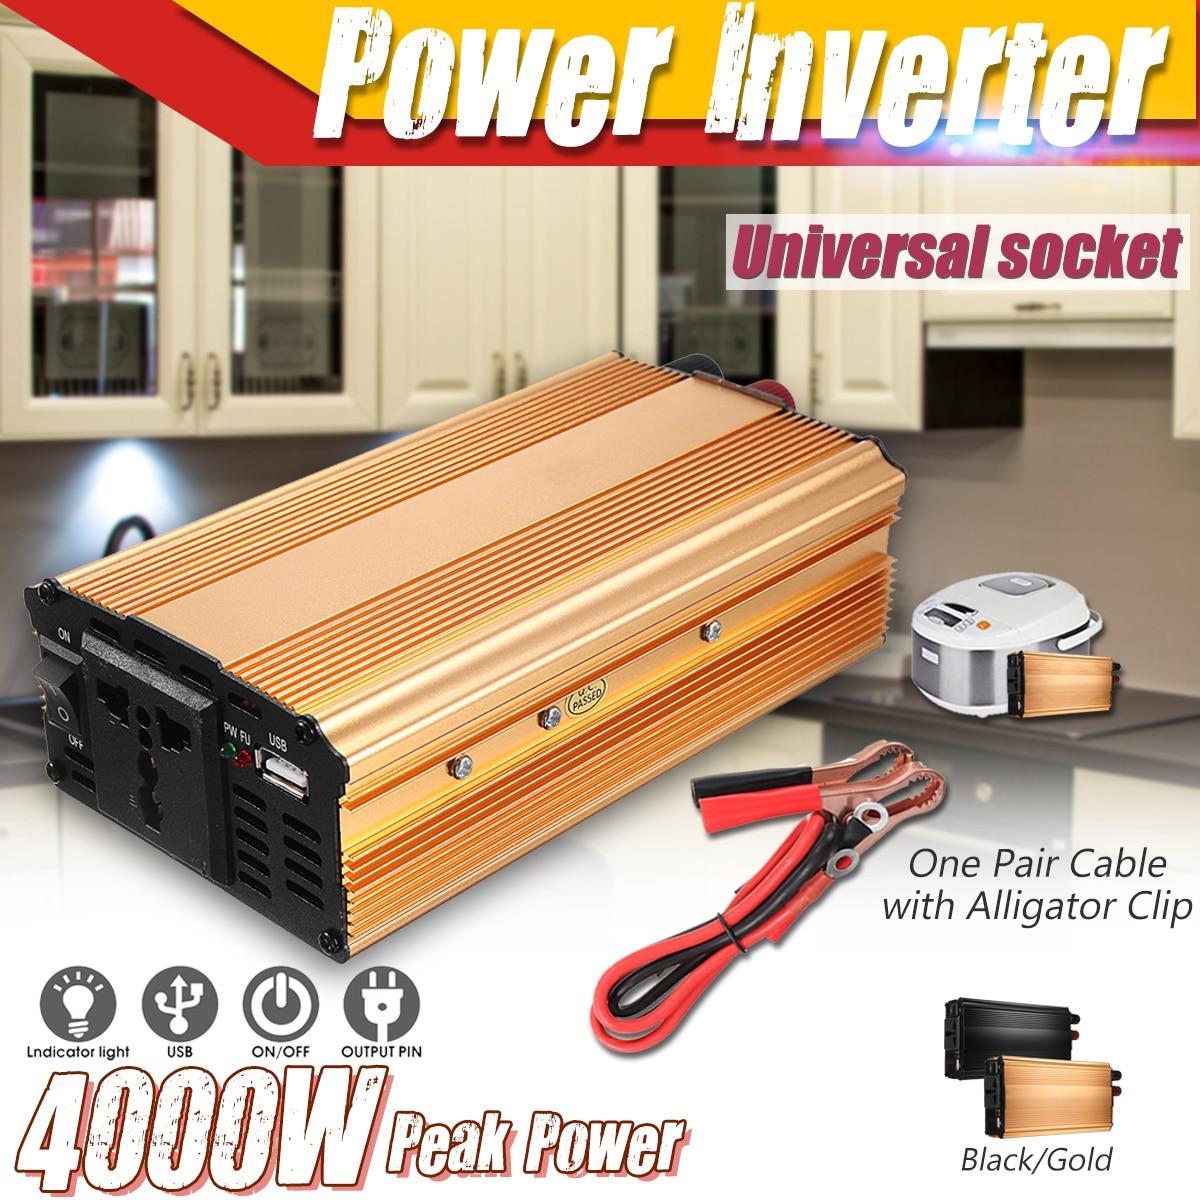 Pico W Cargador 4000 24 V 12 220 Convertidor Corriente Inversor 1 Solar Del Transformador Voltaje Coche De 5LcSq4Rj3A